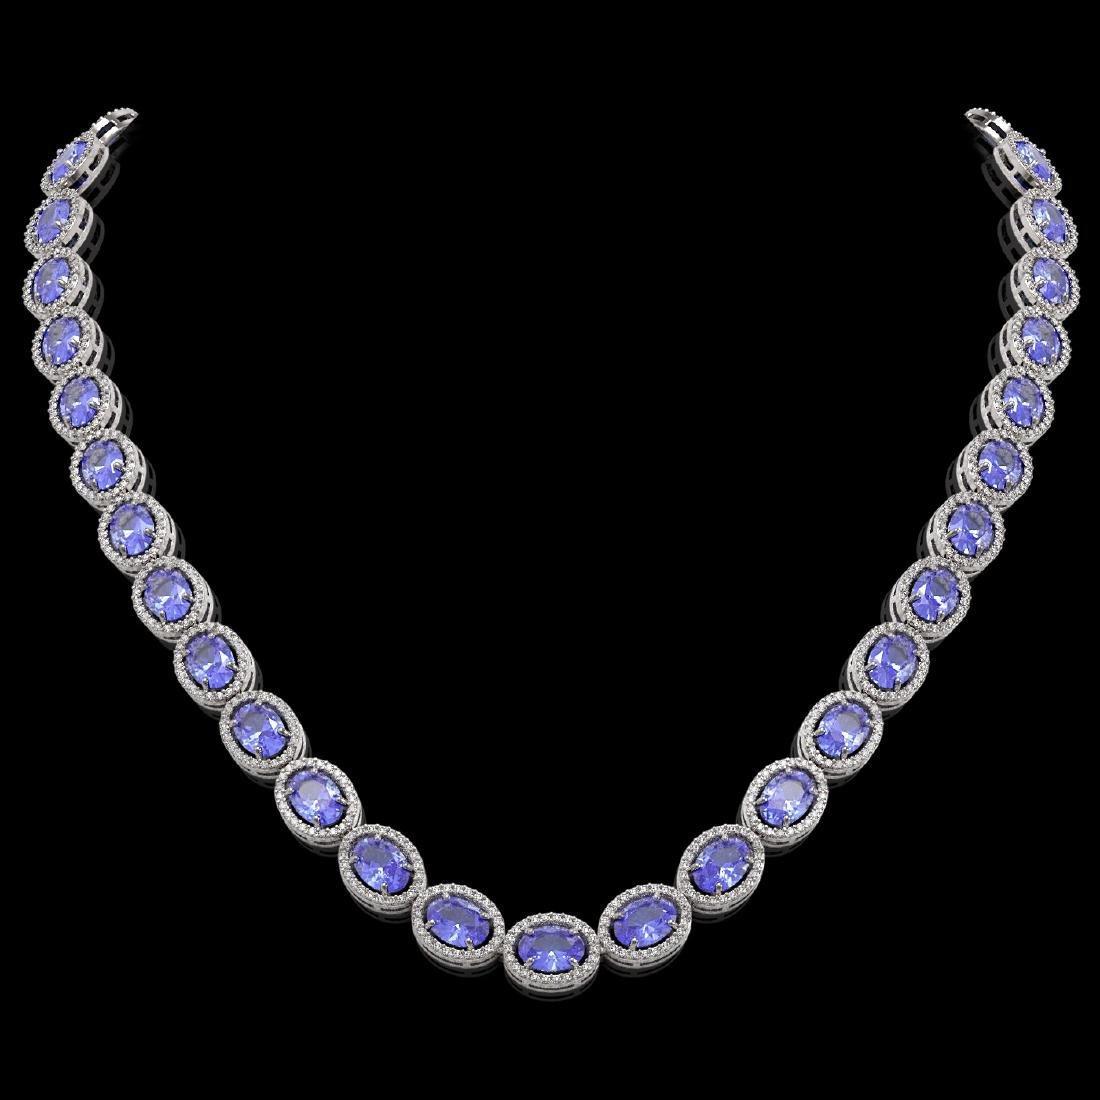 48.65 CTW Tanzanite & Diamond Halo Necklace 10K White